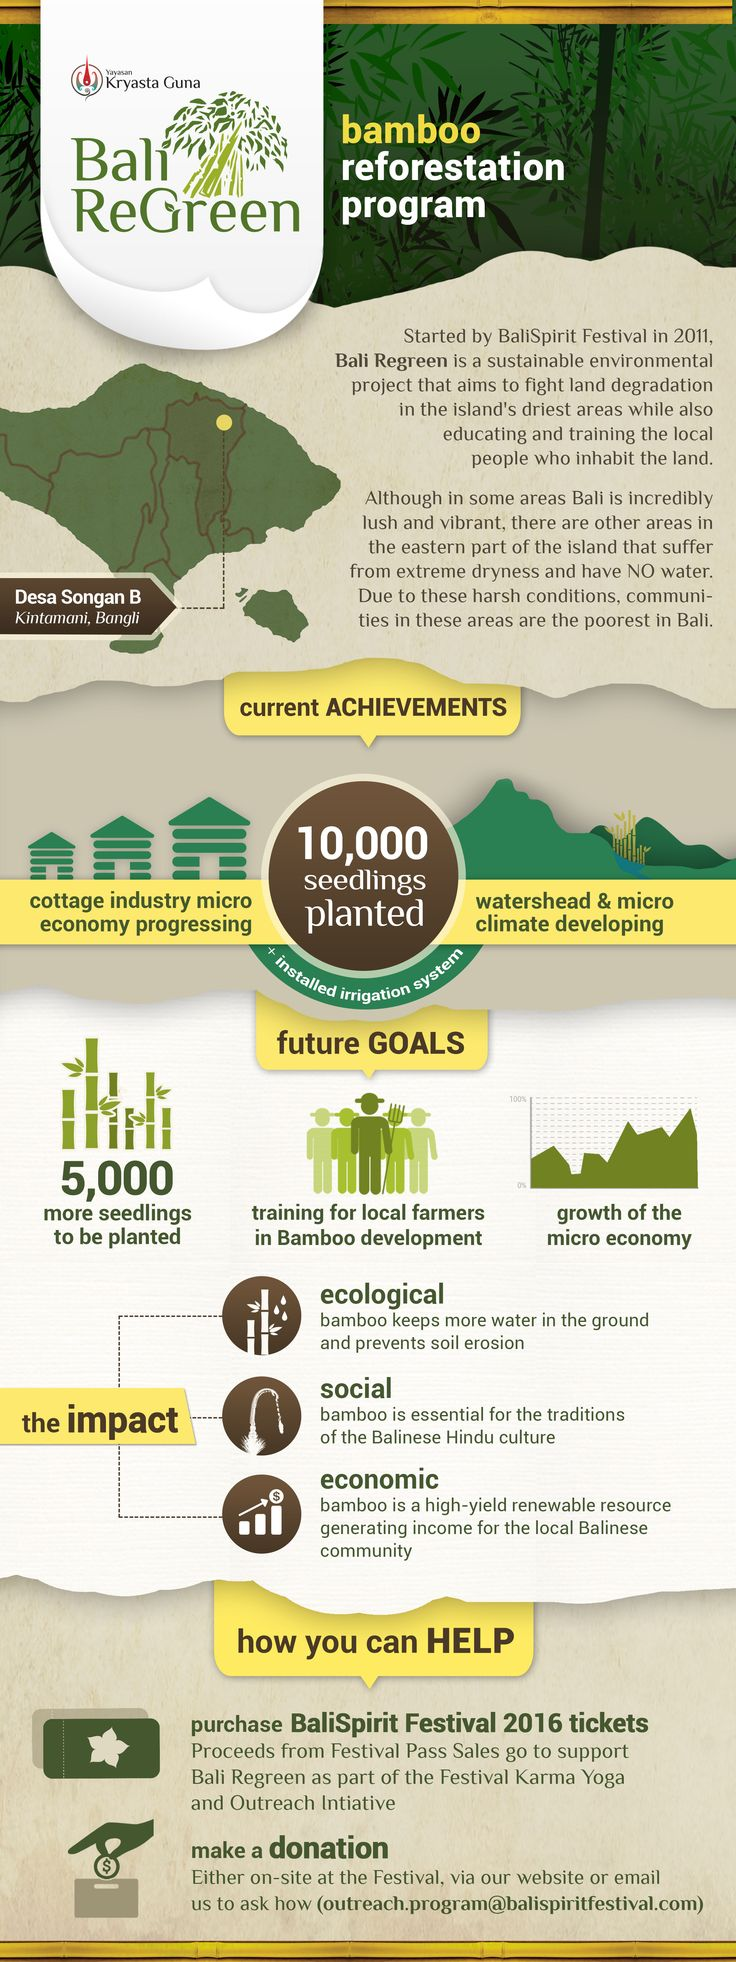 bali regreen bamboo reforestation program by BaliSpirit Festival